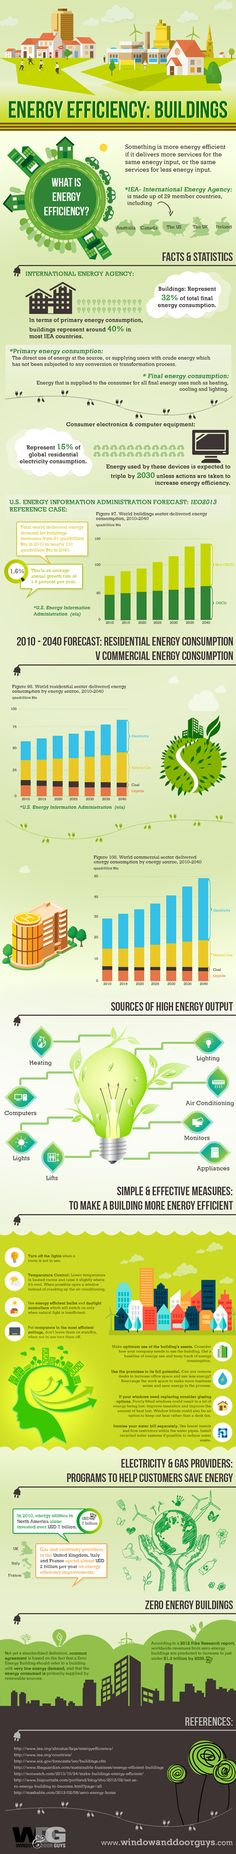 Energy efficiency infographic, infographic, energy efficiency, making buildings more energy efficient